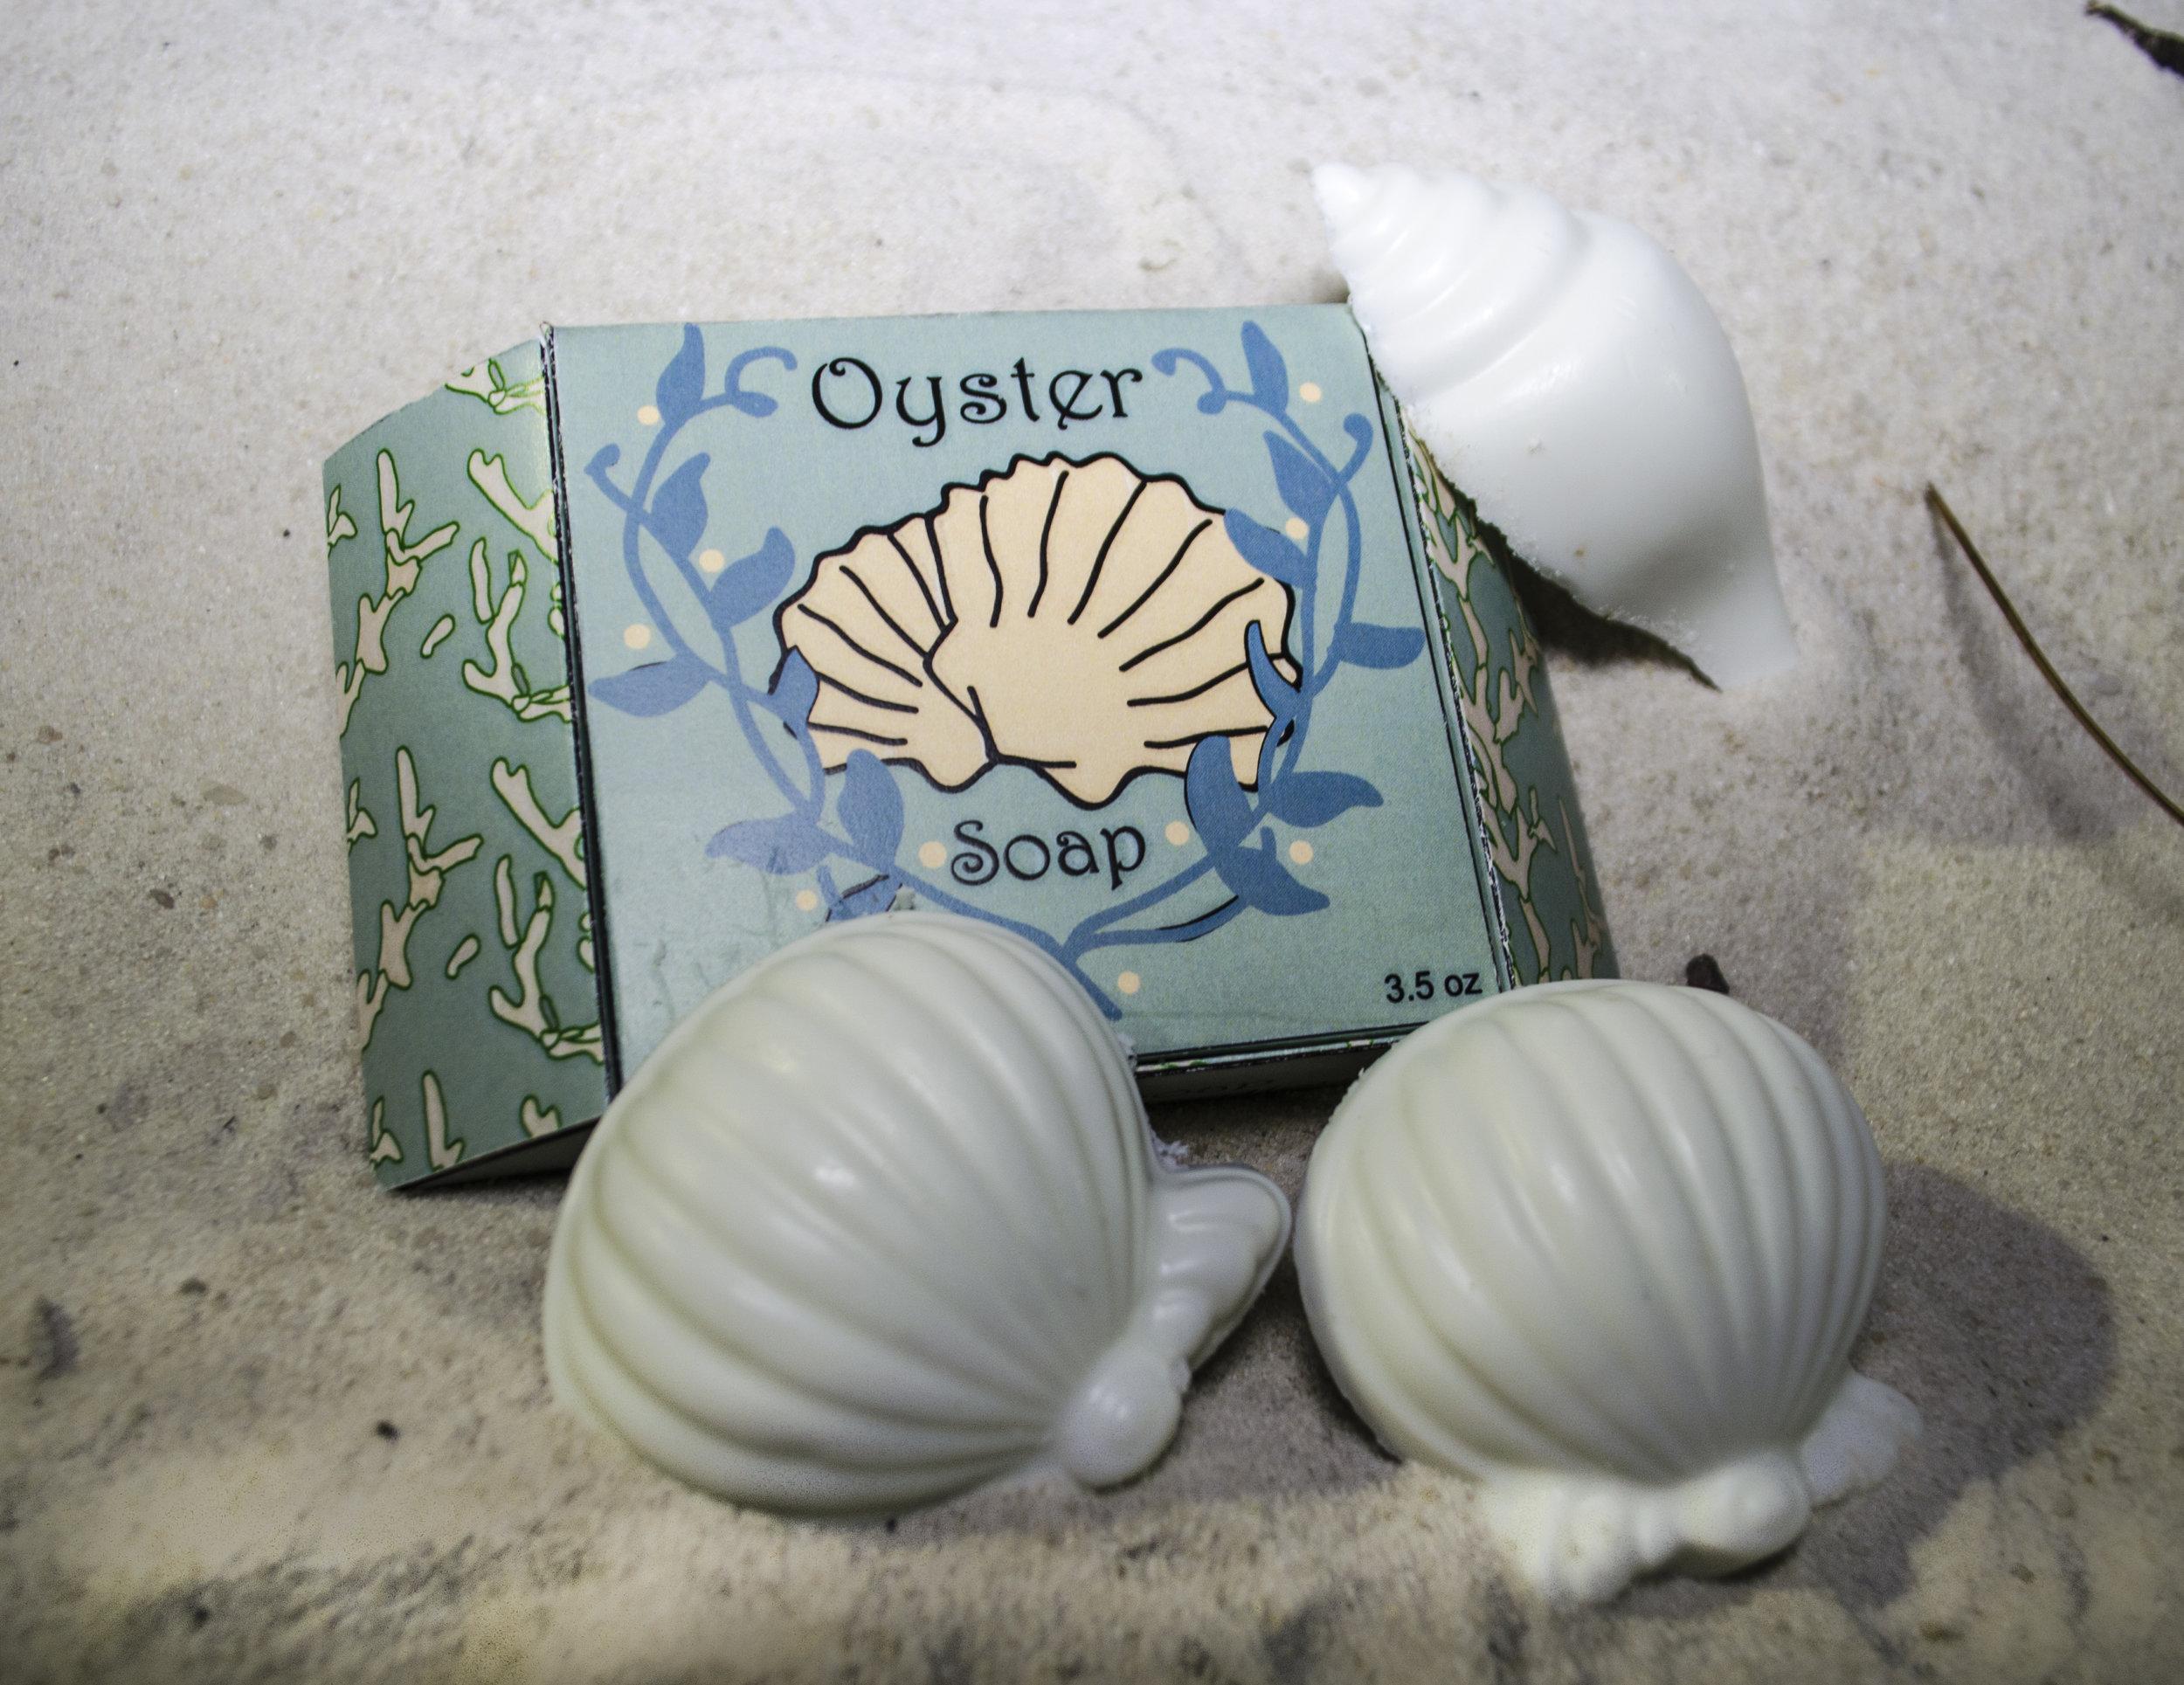 Camamcho_Nallely_ oyster final.jpg